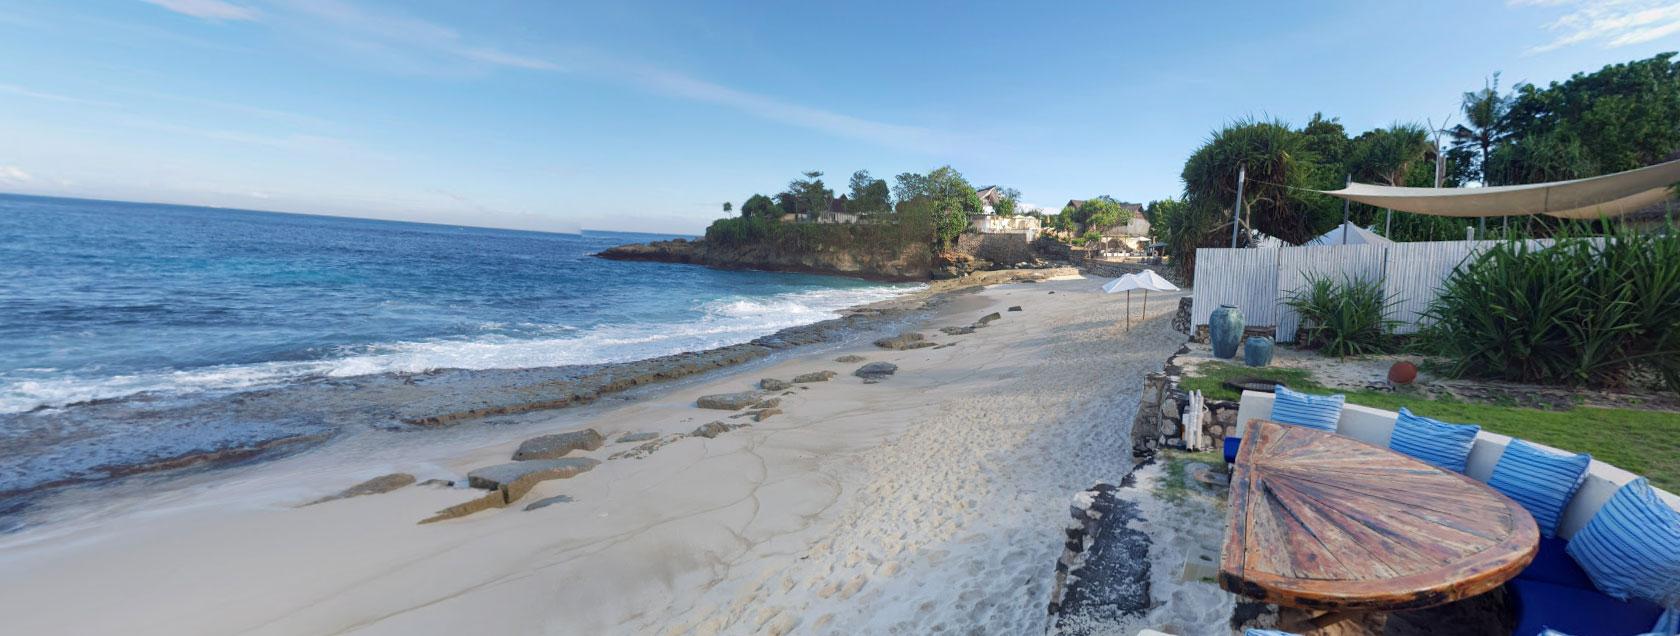 Sandy Bay - Lembongan Beaches